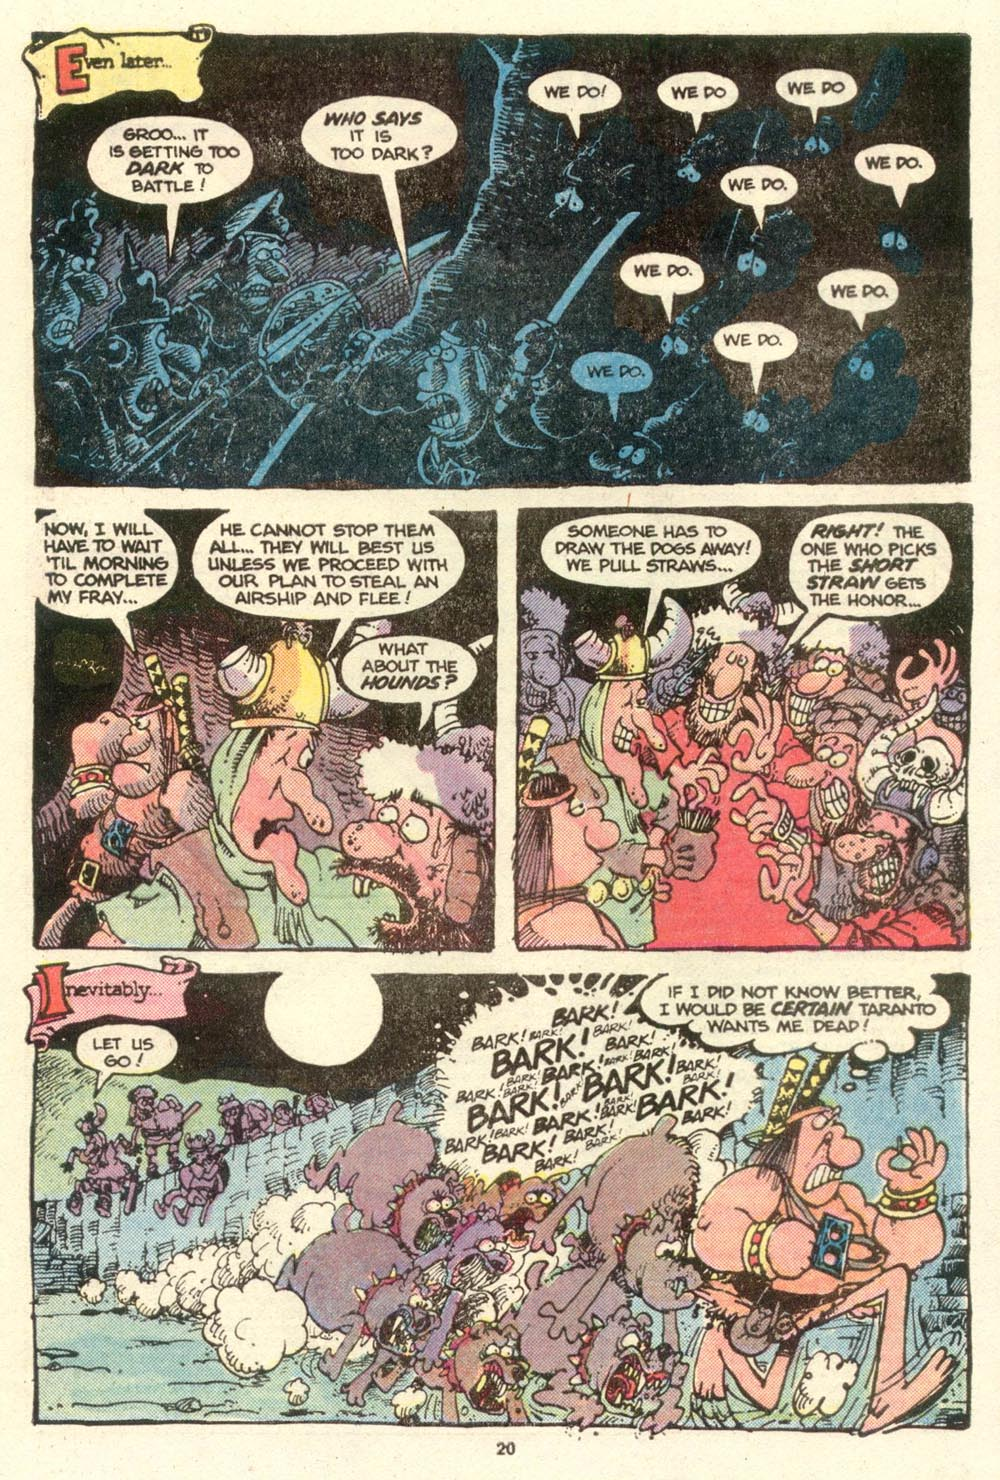 Read online Sergio Aragonés Groo the Wanderer comic -  Issue #16 - 20